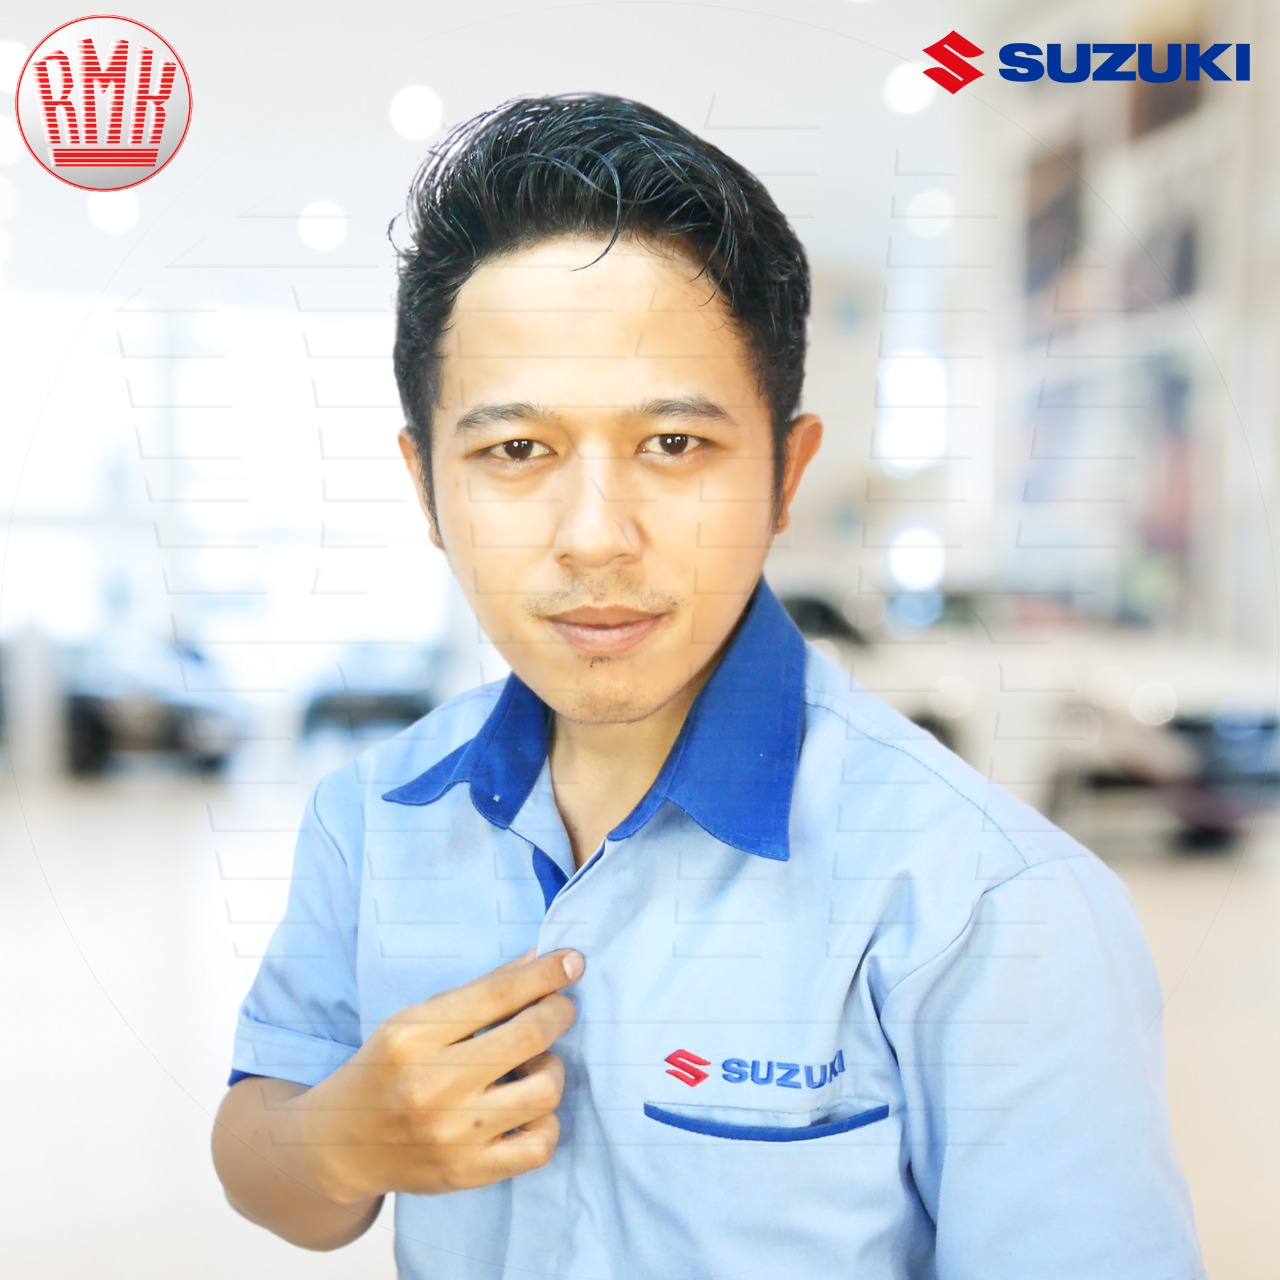 Alfi Sales Marketing RMK Cimanggis Depok